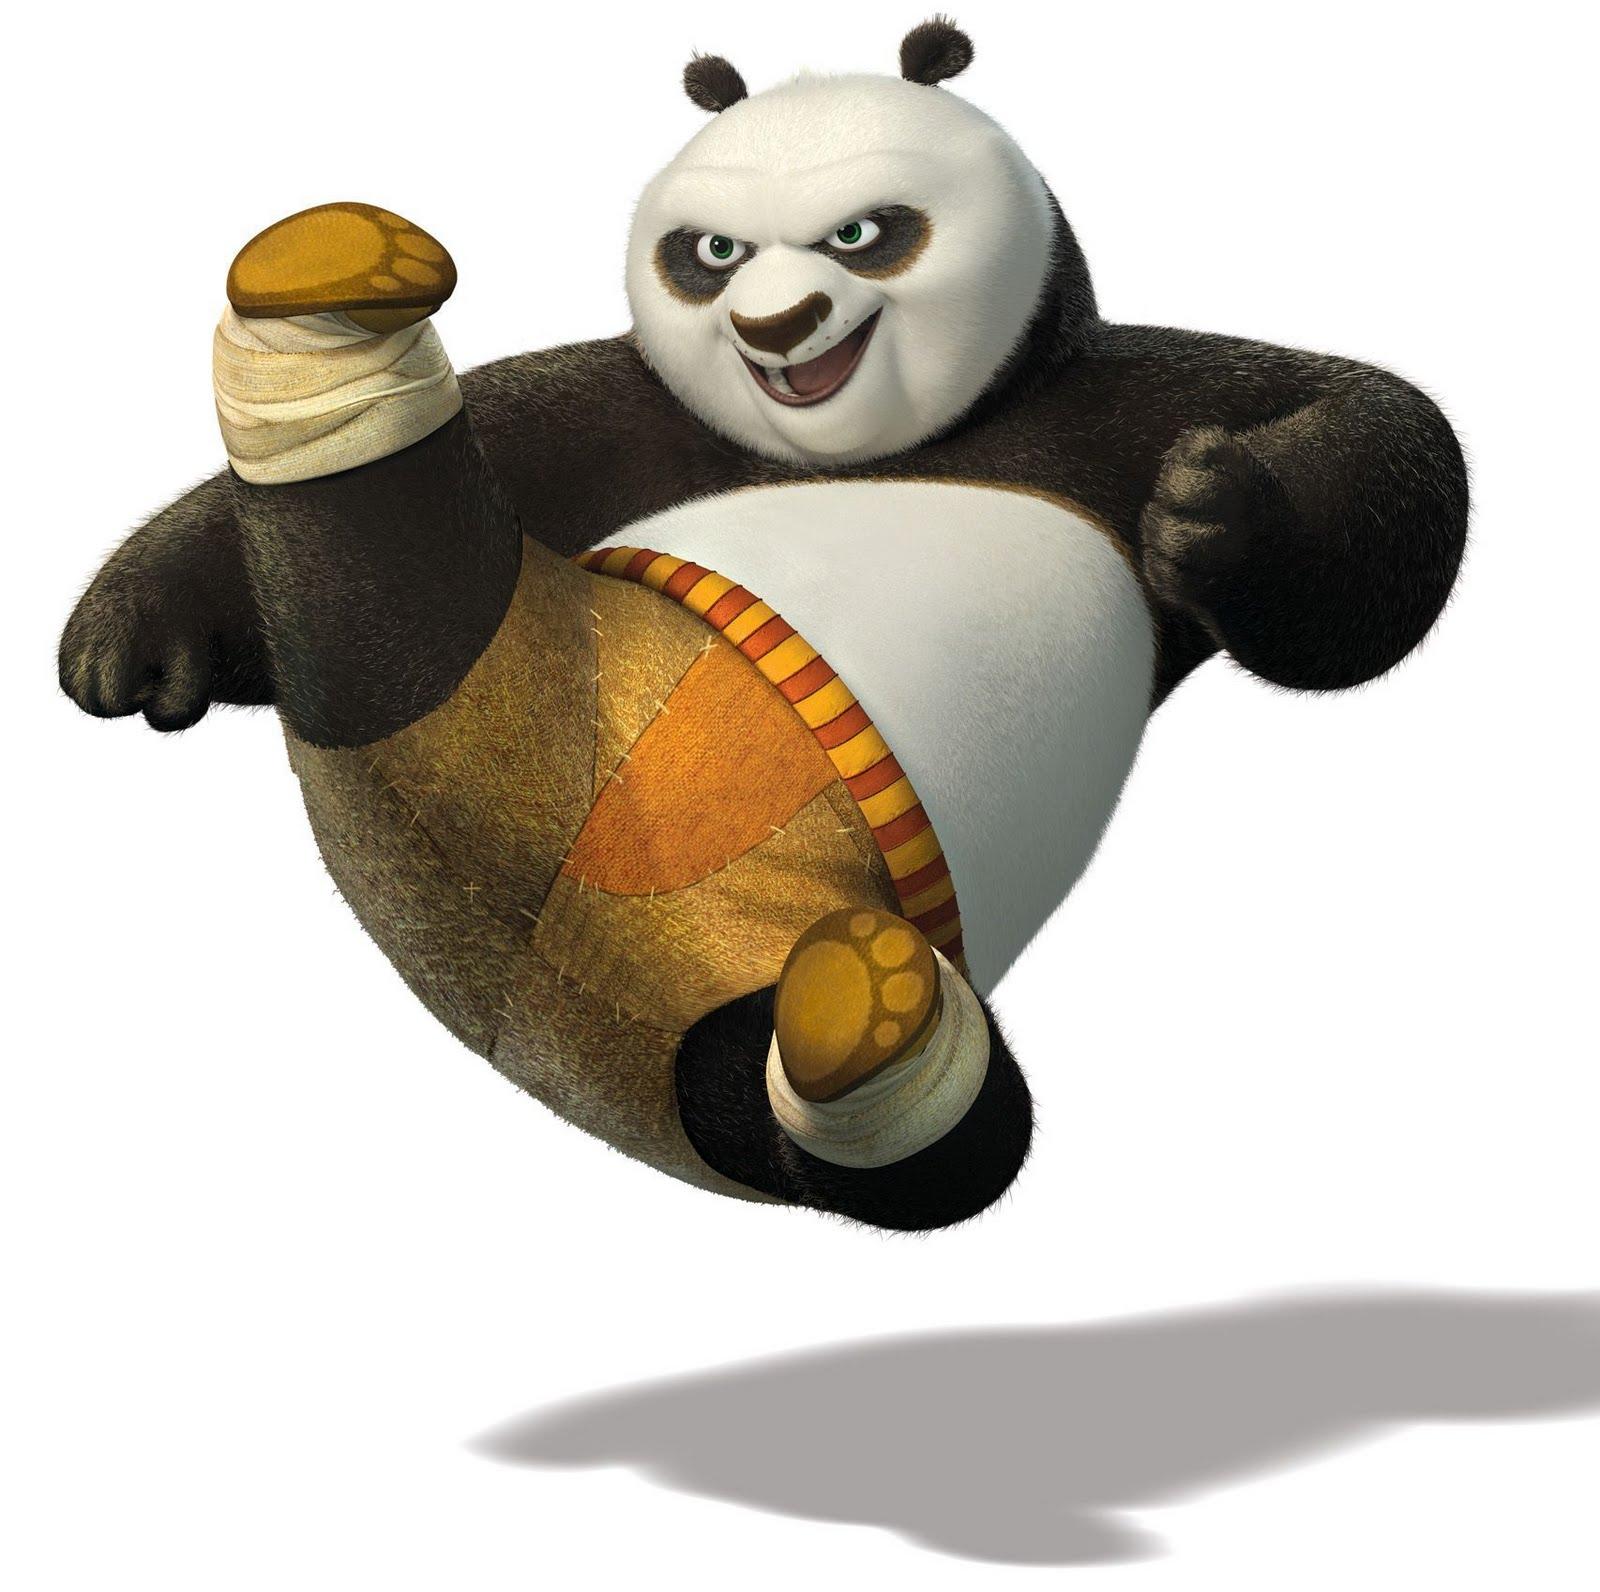 http://1.bp.blogspot.com/-gq-uOQW10wM/TpVH_USKeAI/AAAAAAAAHVw/Bwrba7tvKQU/s1600/kung+fu+panda+2+hd+wallpapers+3.jpg